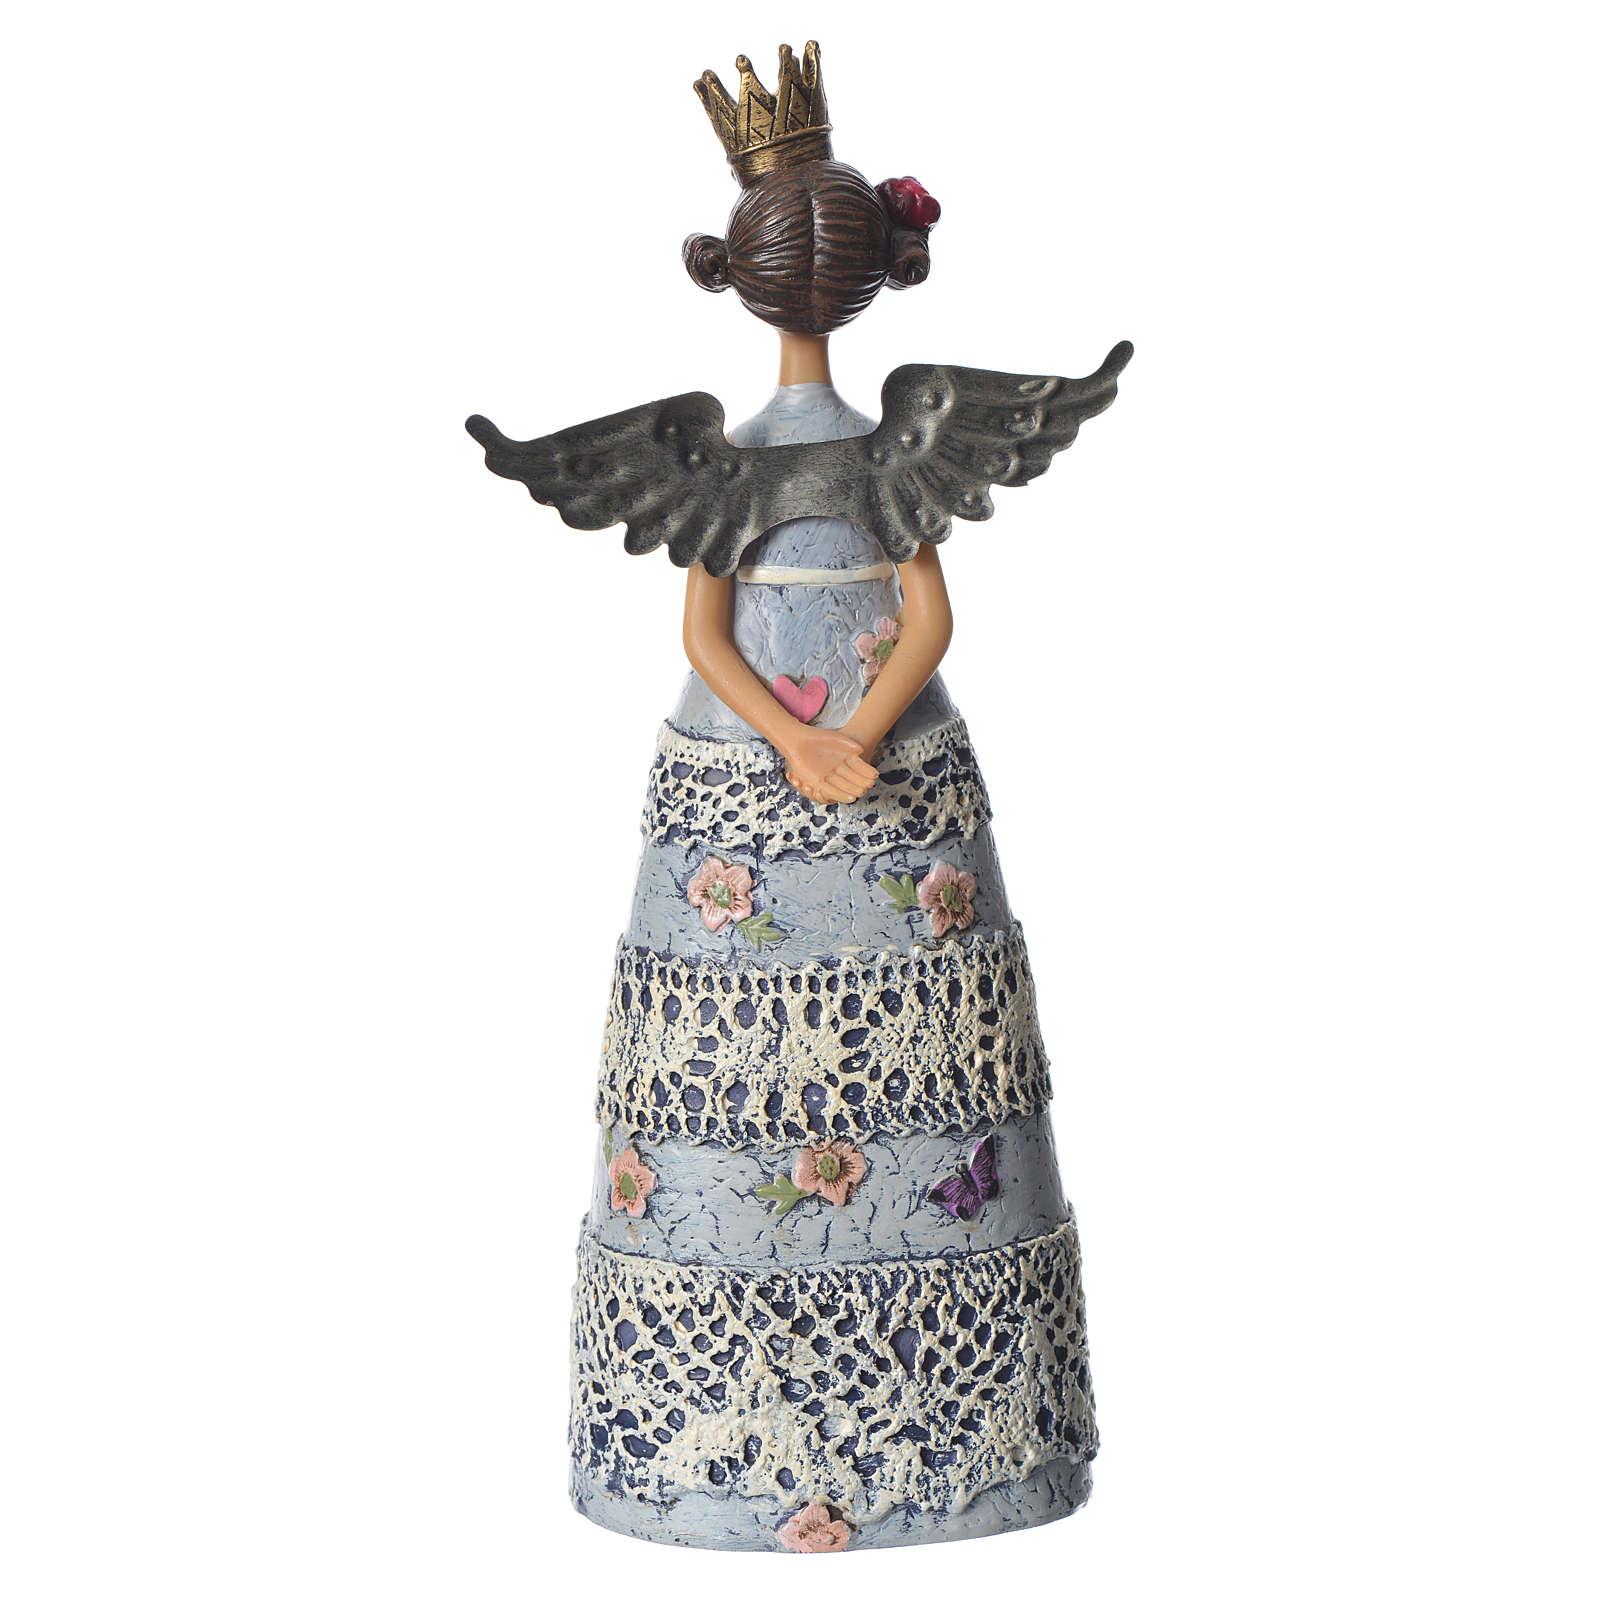 Dear Daughter Angel figurine 3